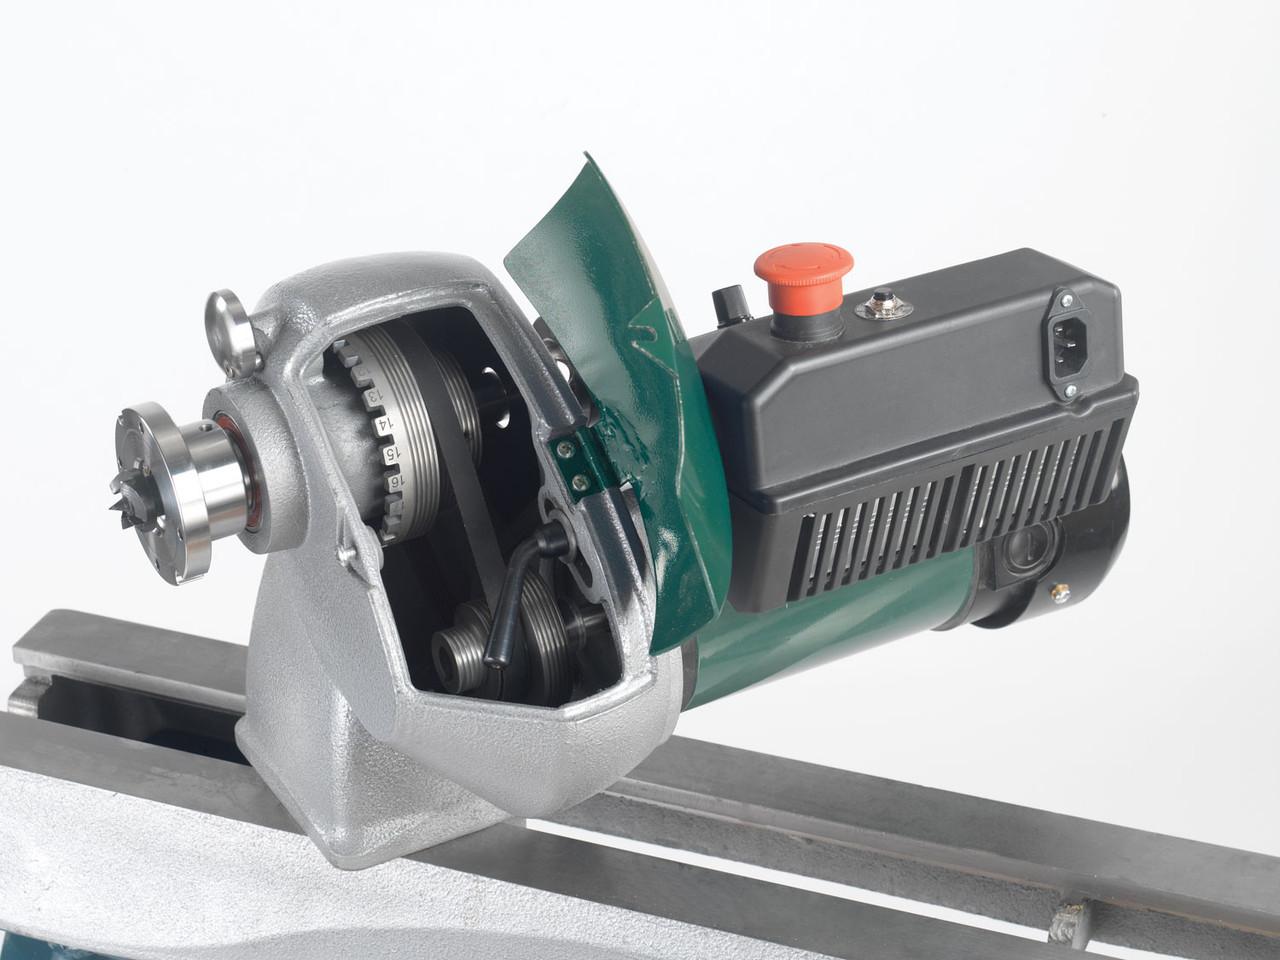 Record Power 16006, Herald Lathe, 110V